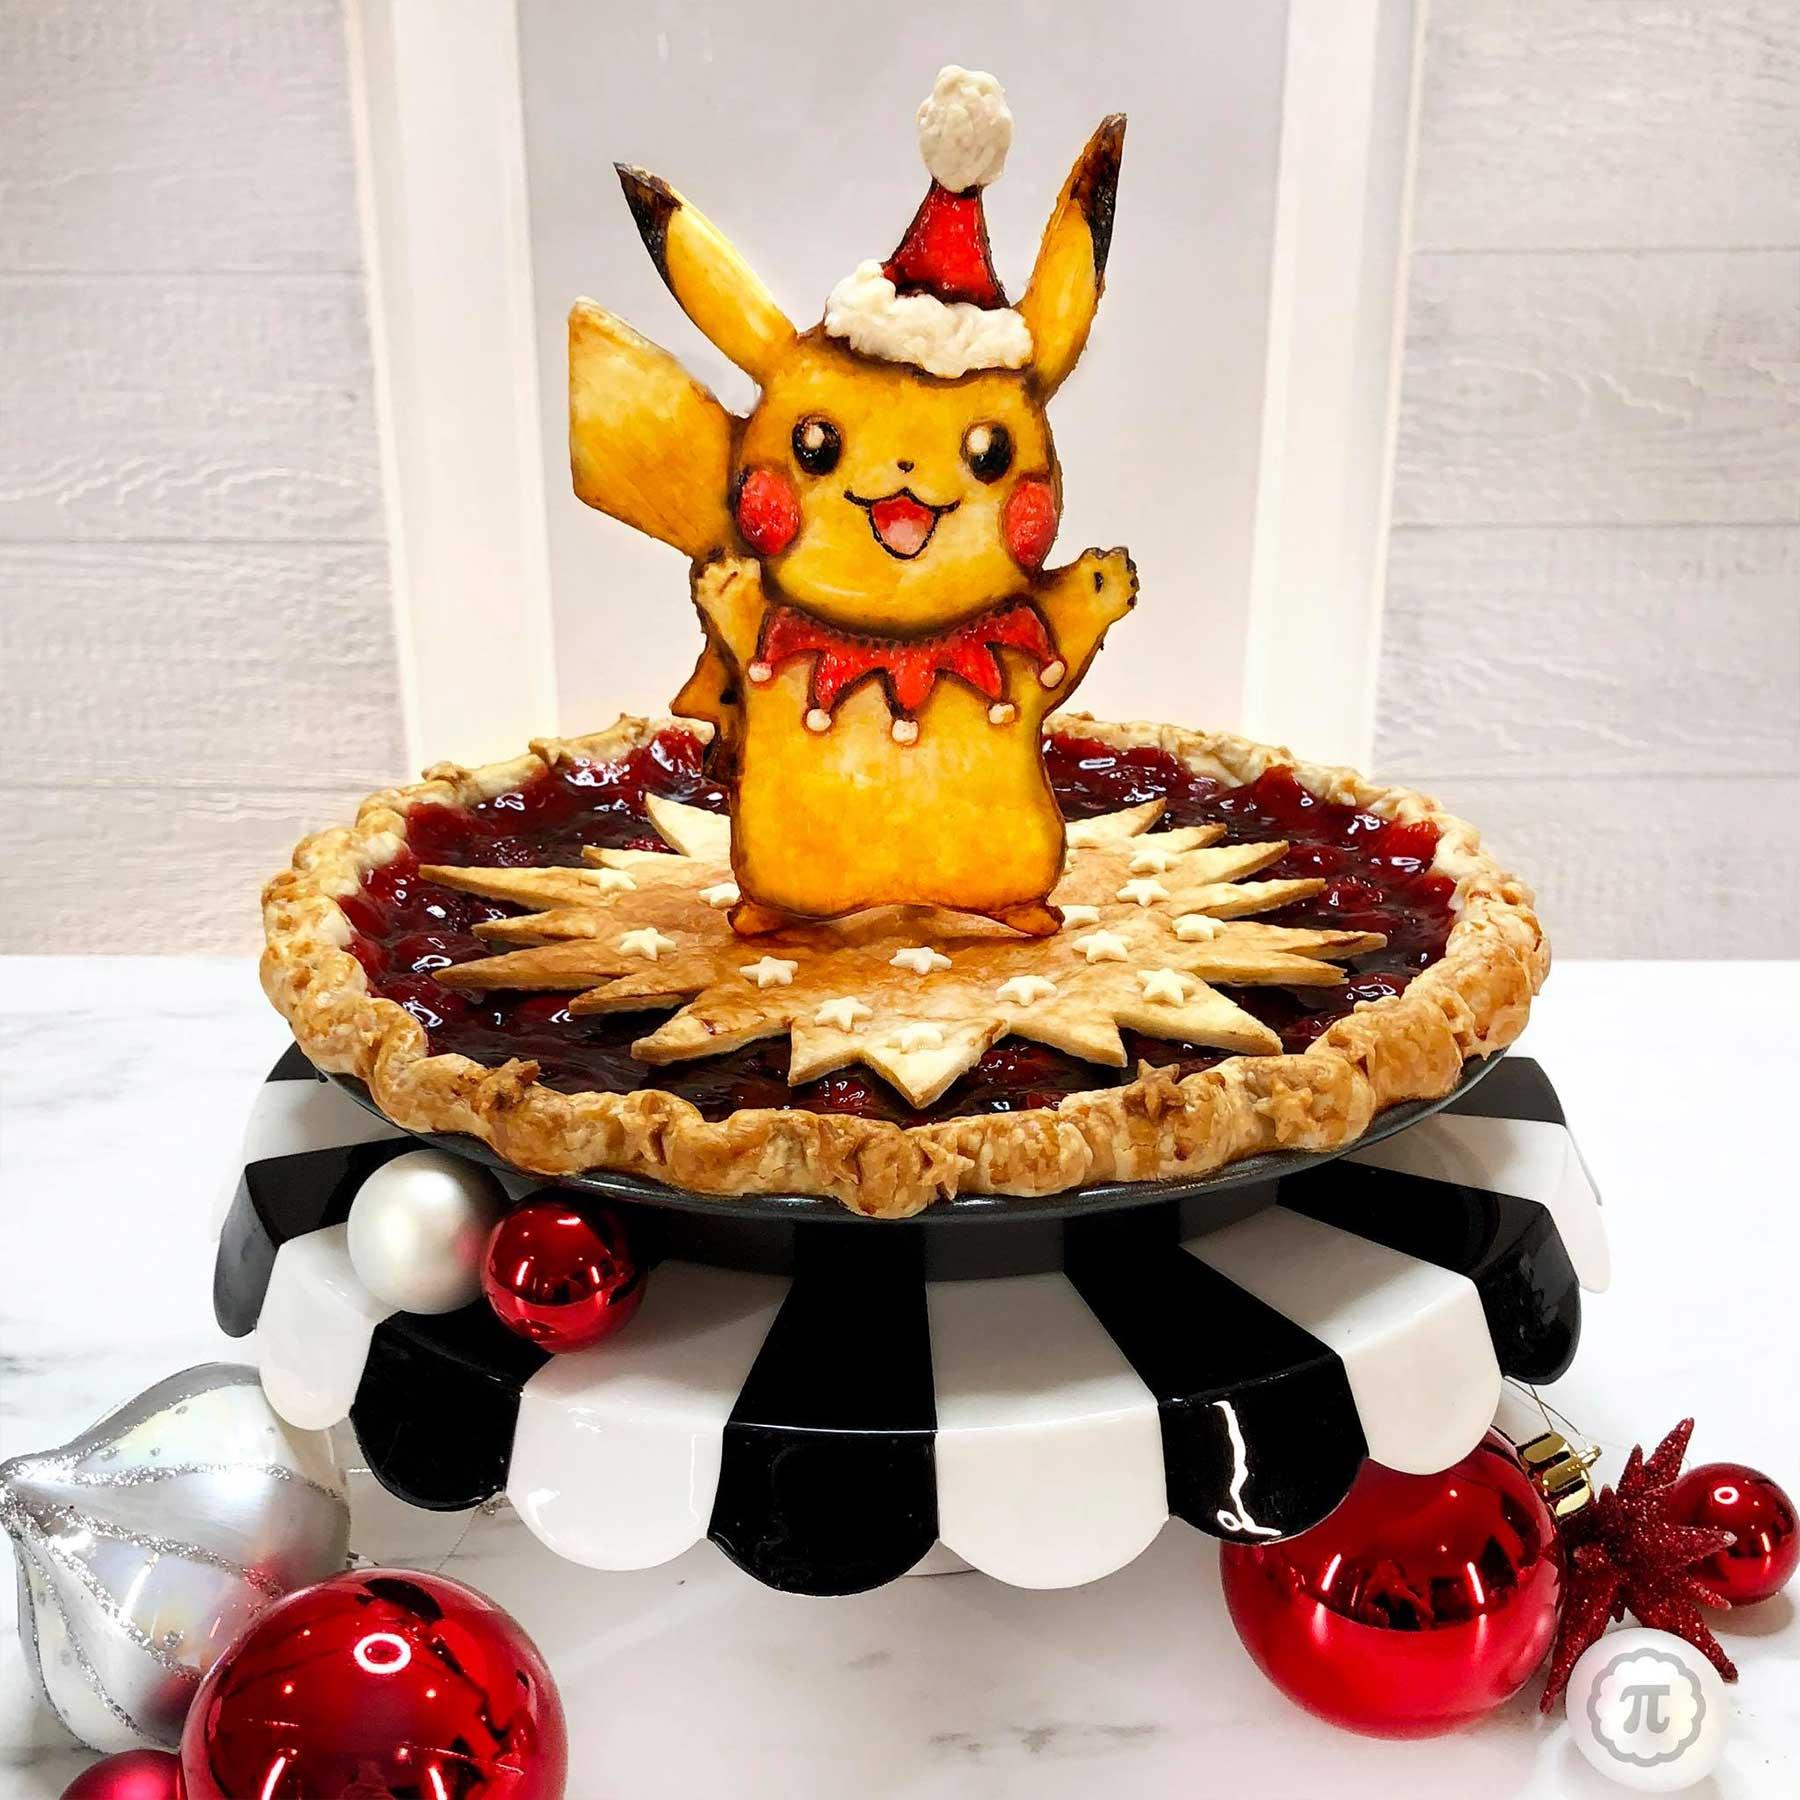 Kreative Kuchenkunst von Jessica Clark-Bojin piesareawesome-Jessica-Clark-Bojin_11